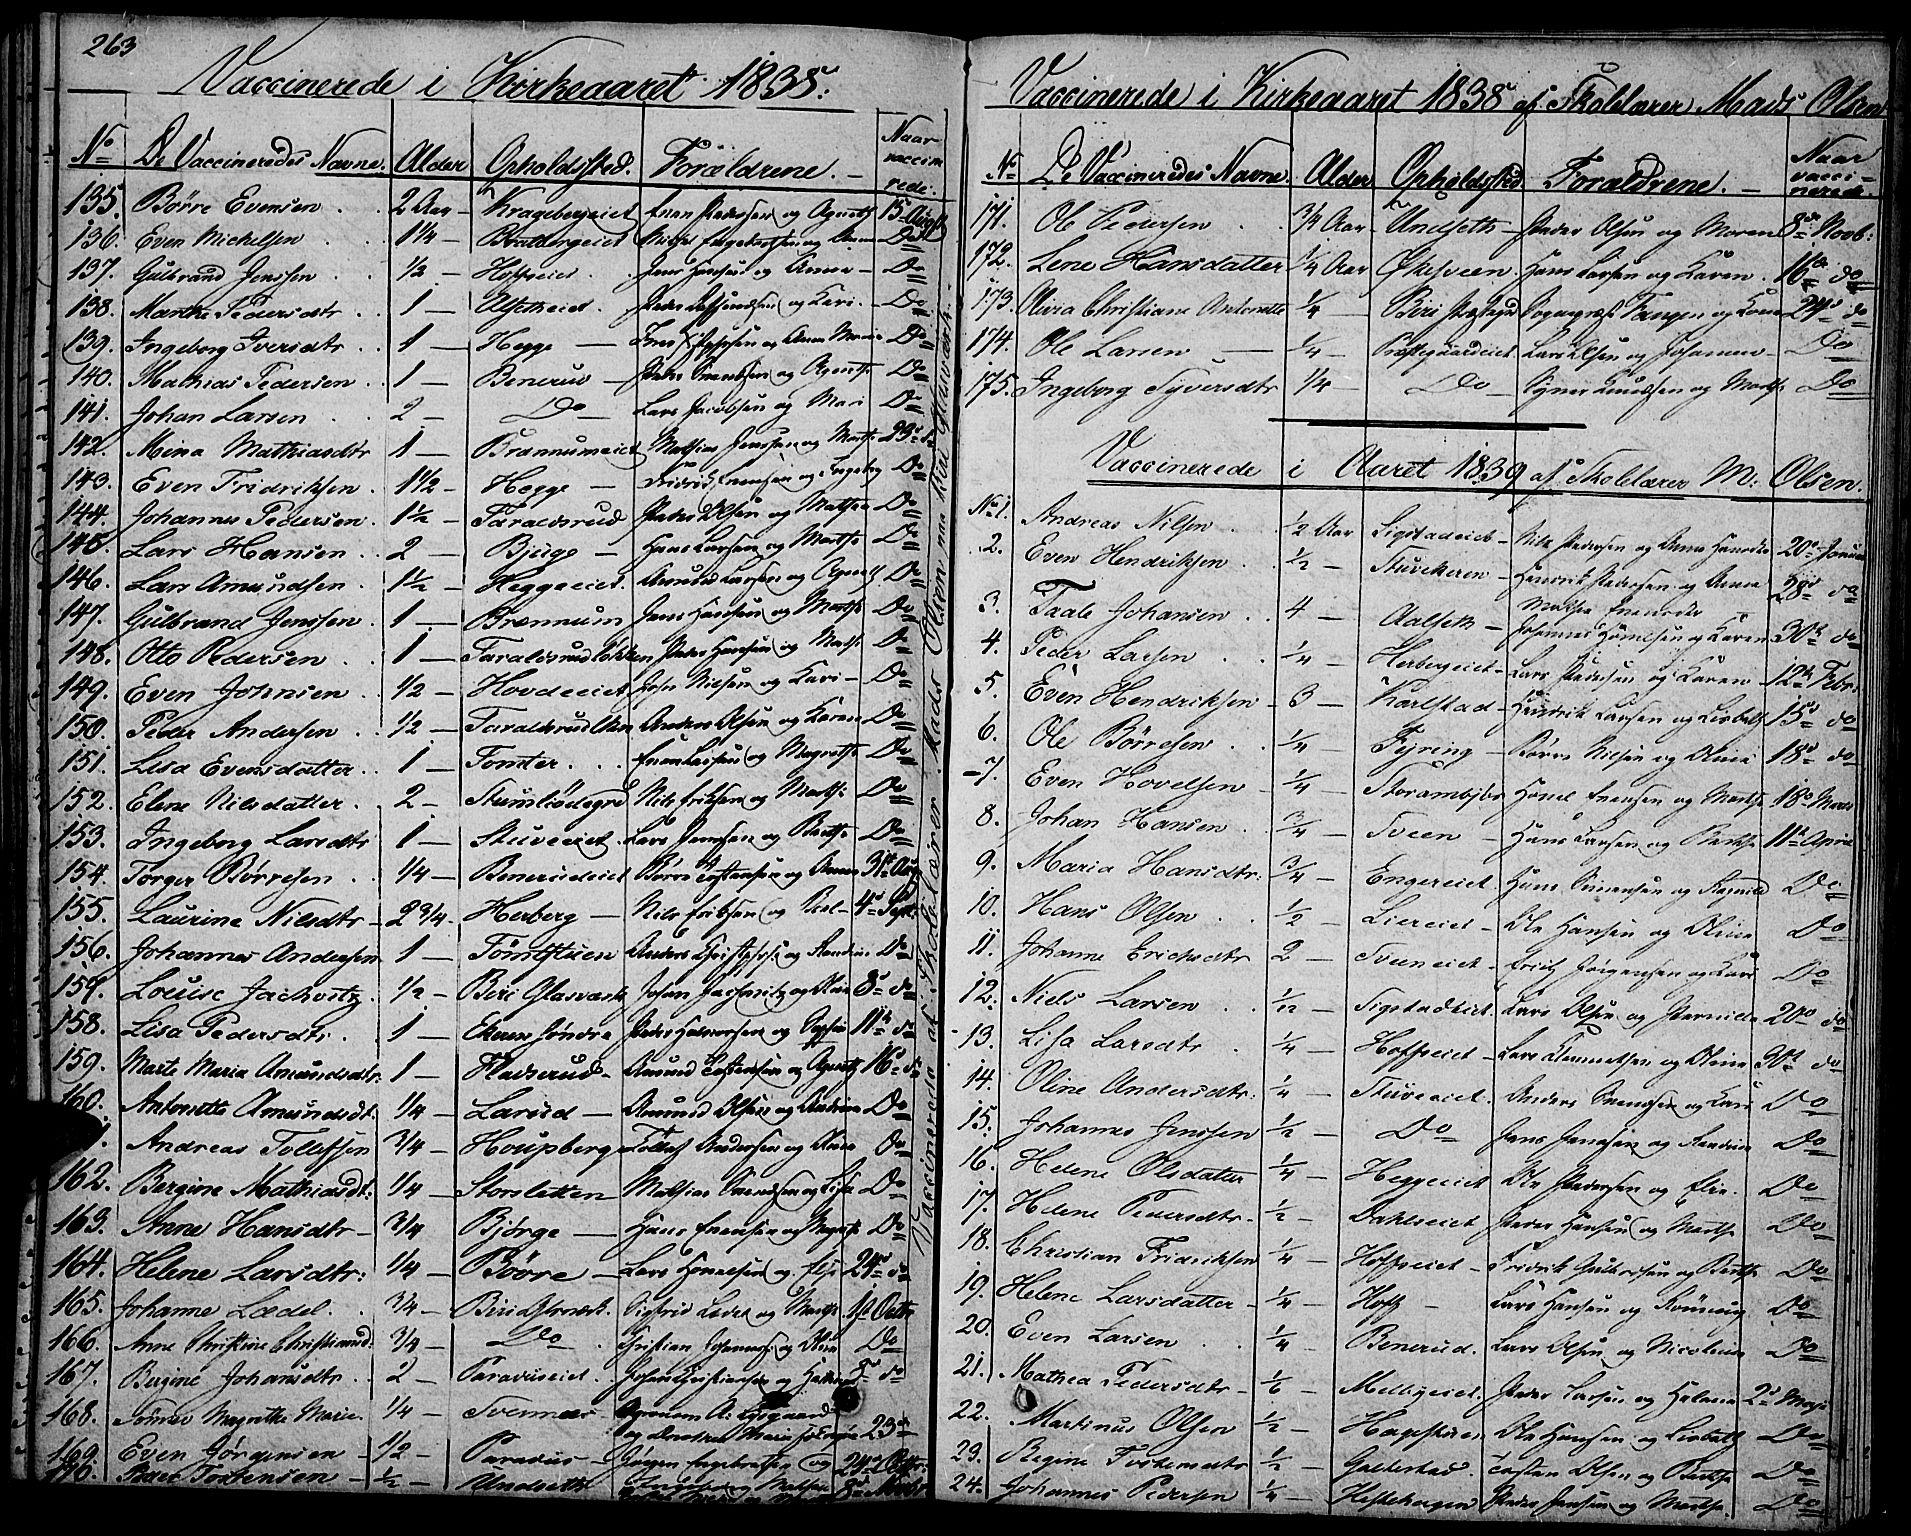 SAH, Biri prestekontor, Ministerialbok nr. 4, 1829-1842, s. 263